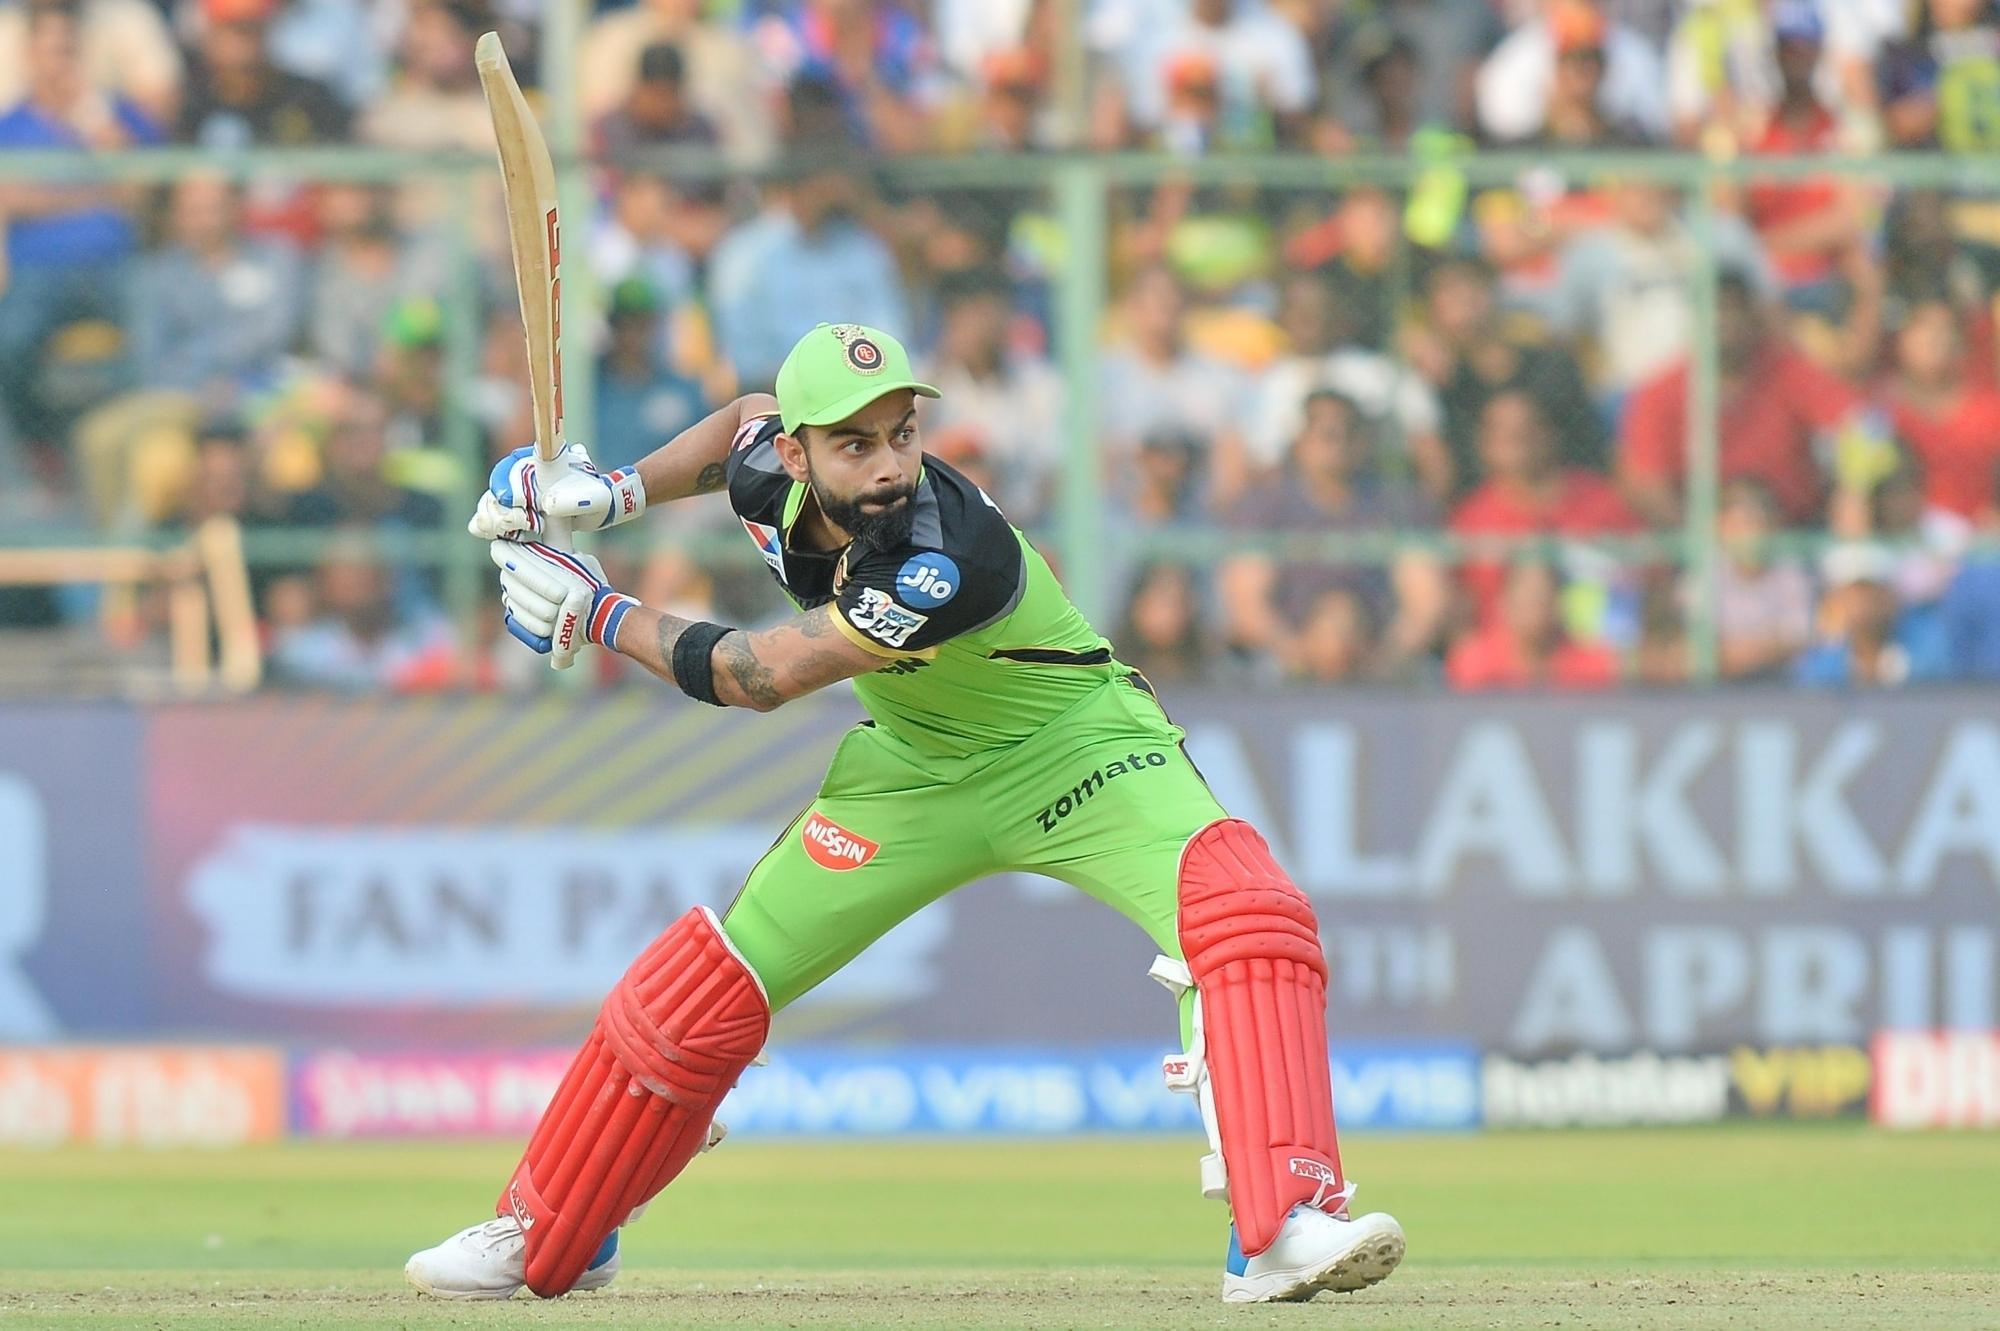 We weren't good enough again, says Kohli after loss